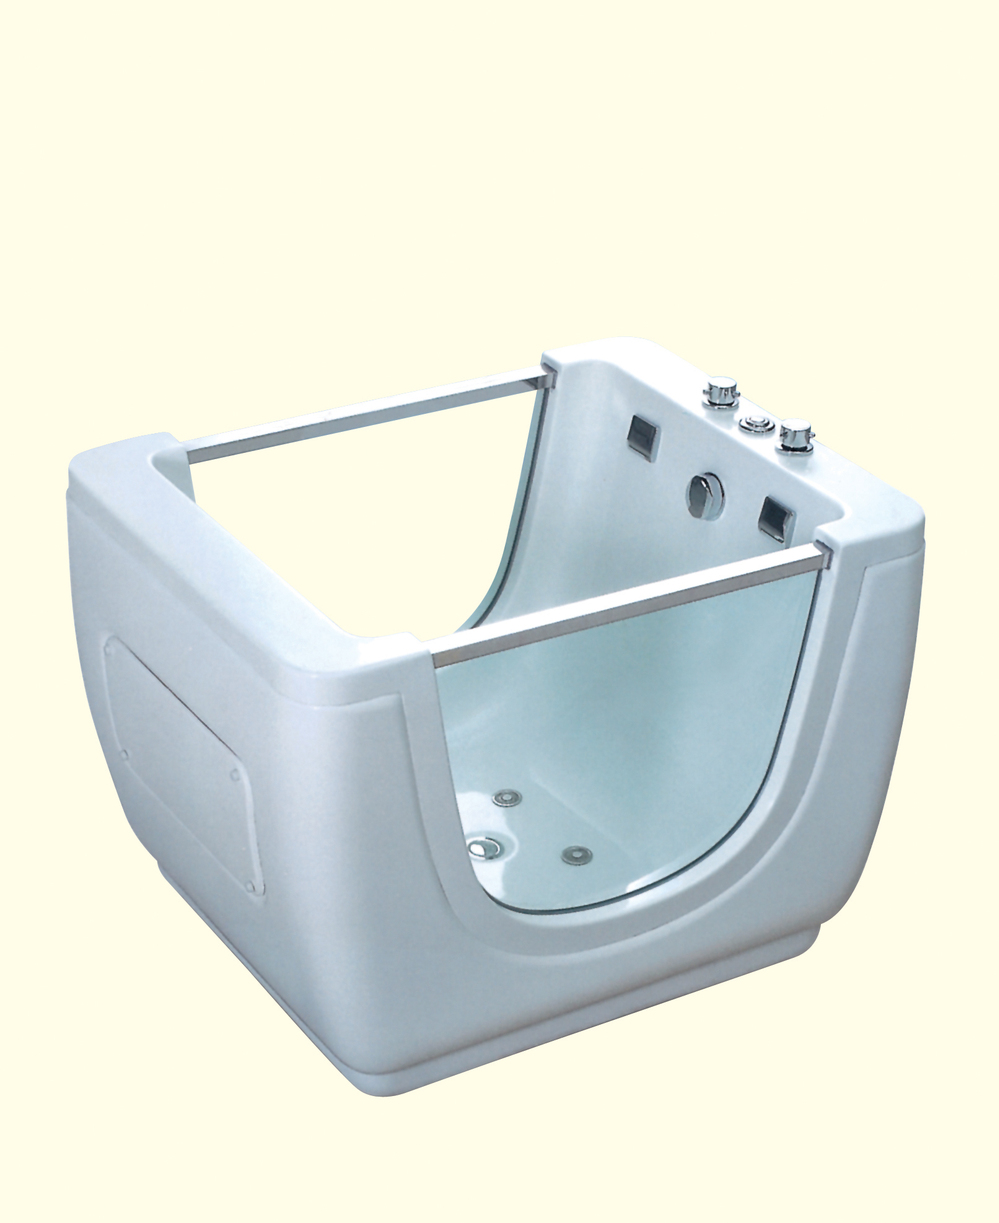 hs b05 mini indoor spa baths new design baby bathtub kids spa buy design ba. Black Bedroom Furniture Sets. Home Design Ideas